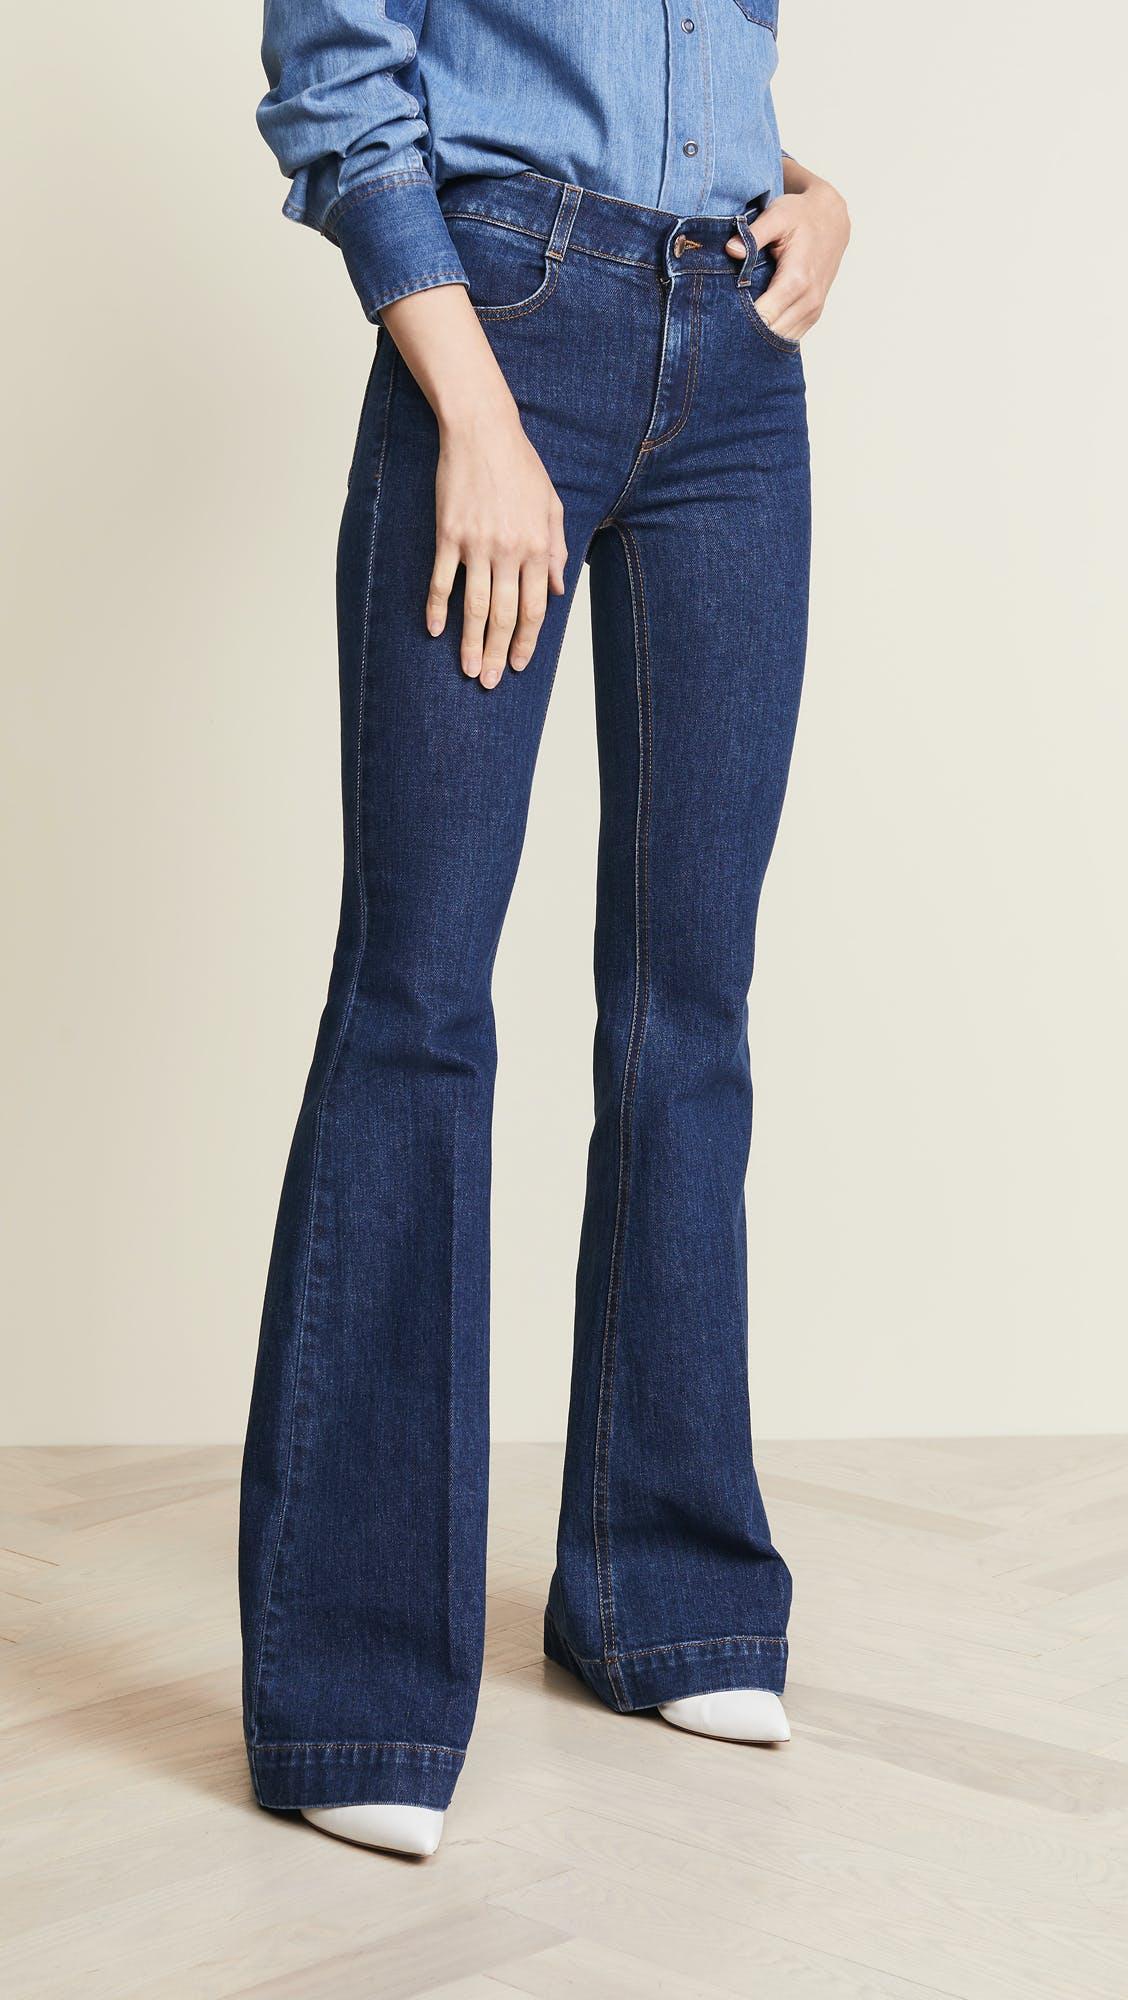 stella mccartney, flared jeans, wide leg jeans, slim flares, stonewashed denim